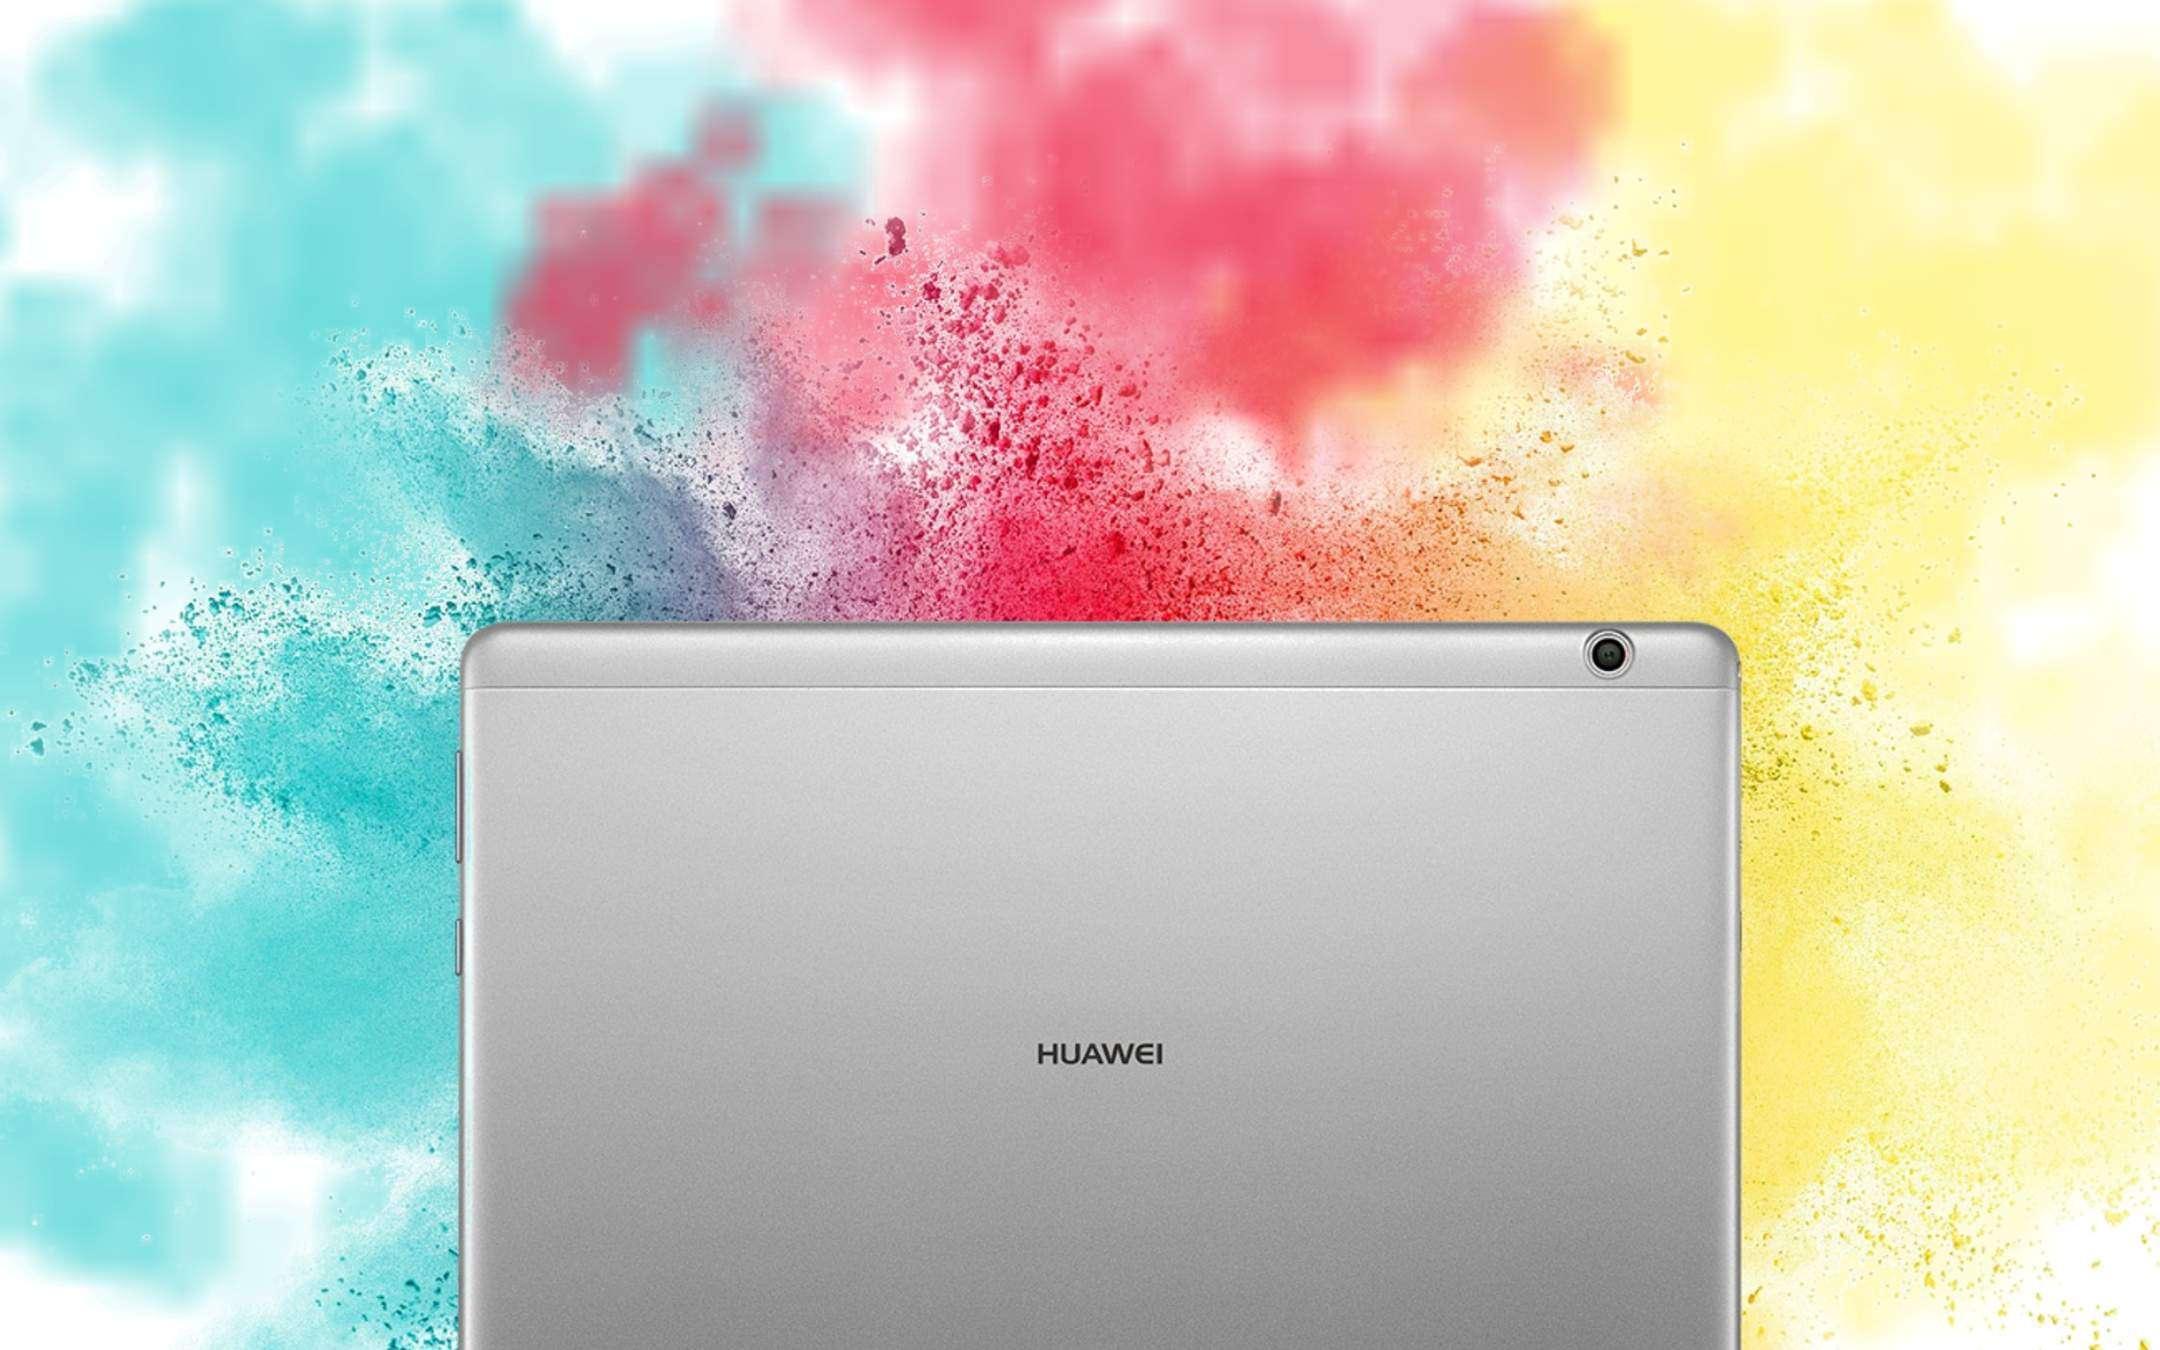 Huawei MediaPad T3 lanciato in Europa